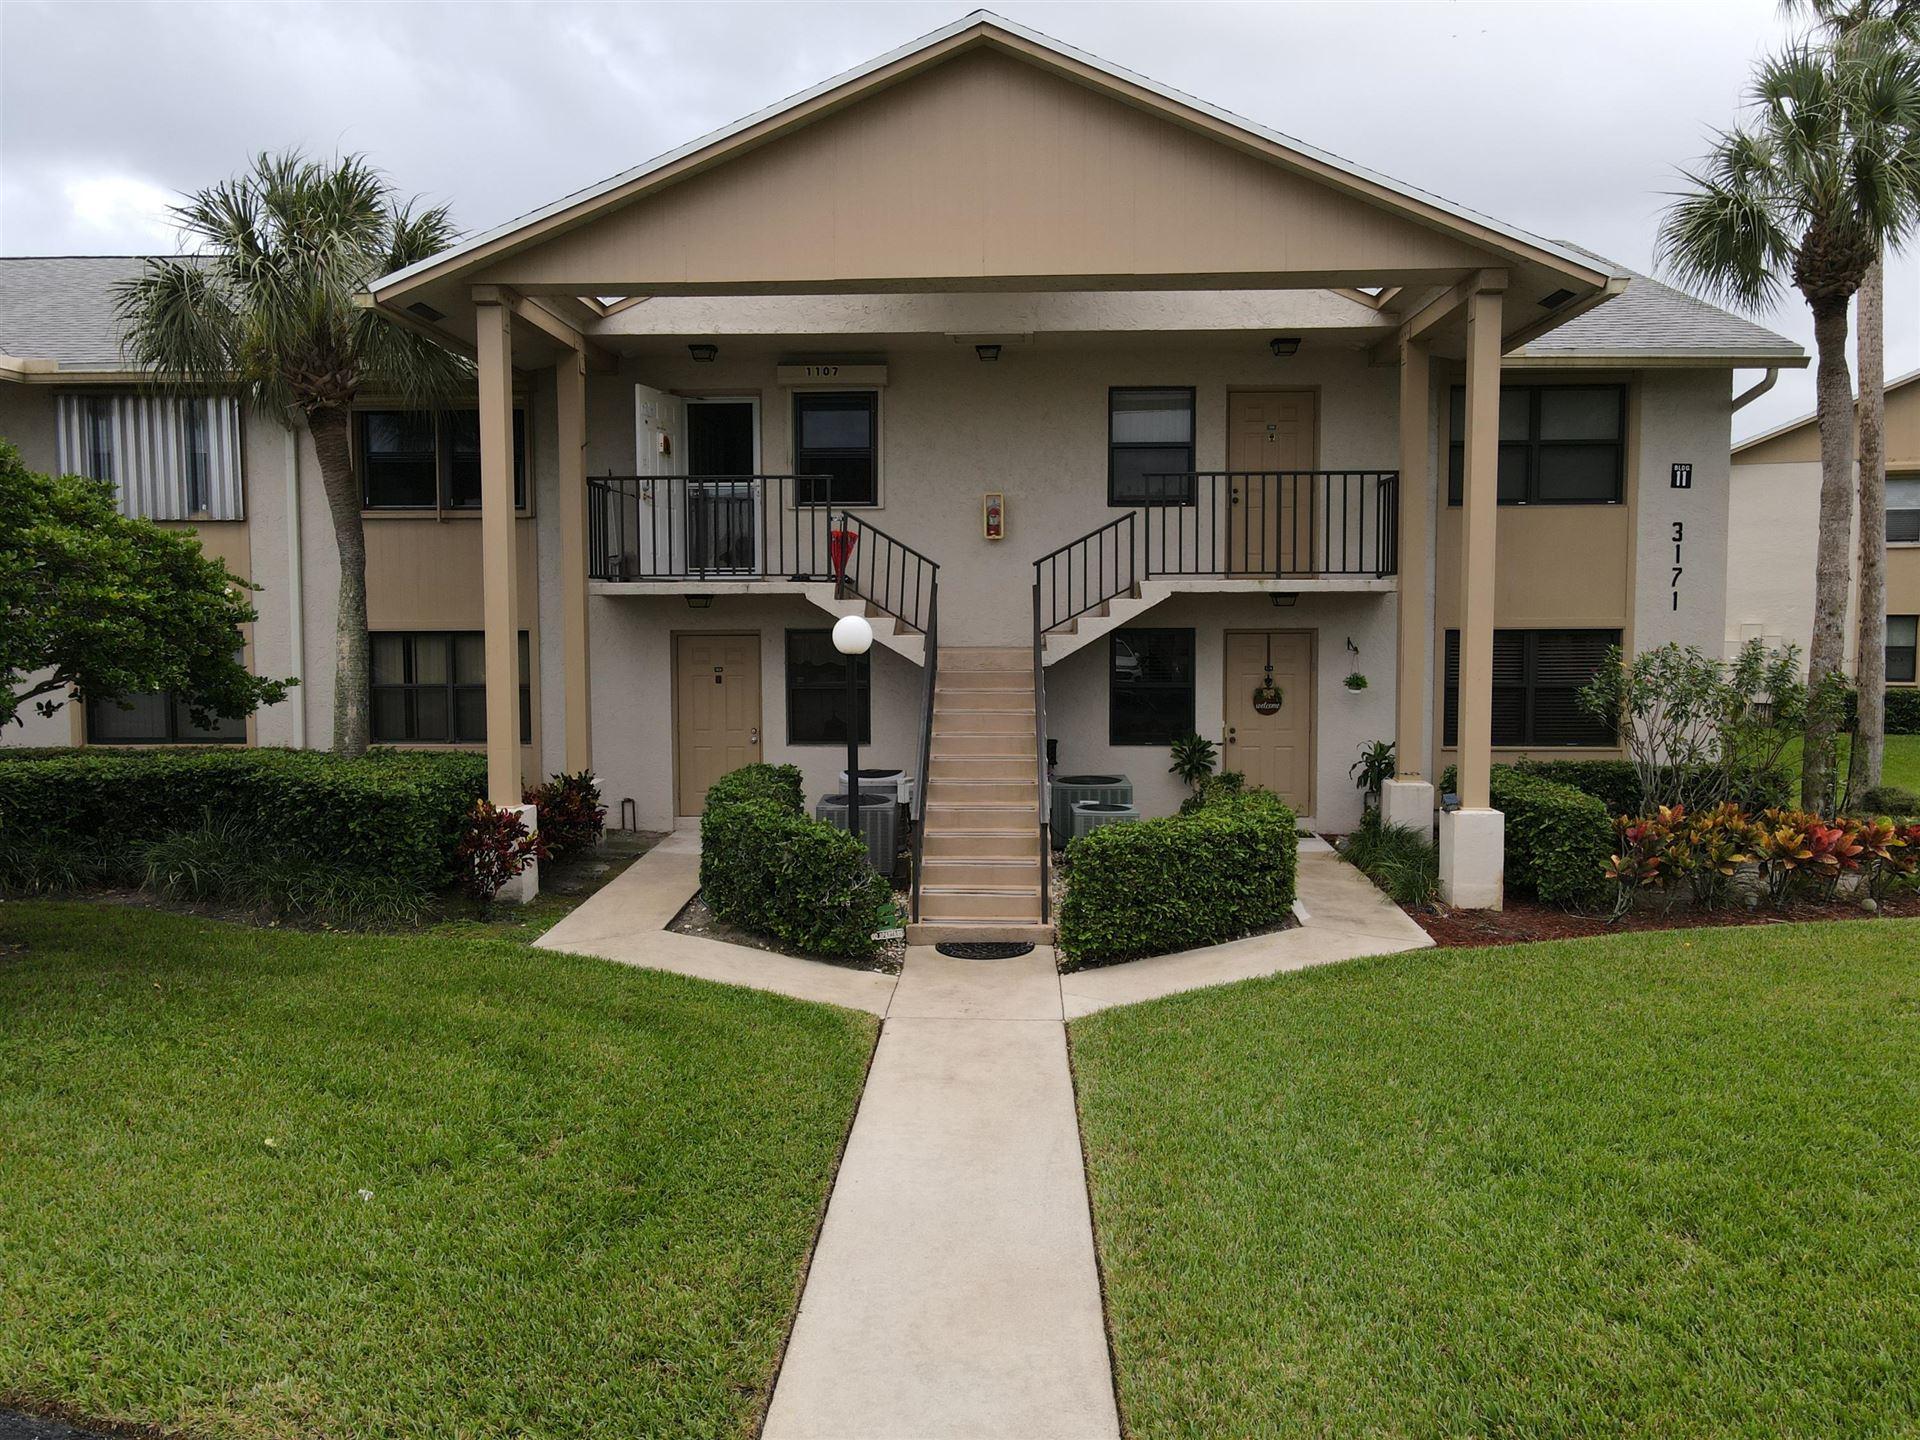 3171 SE Aster Lane #1101, Stuart, FL 34994 - #: RX-10672450